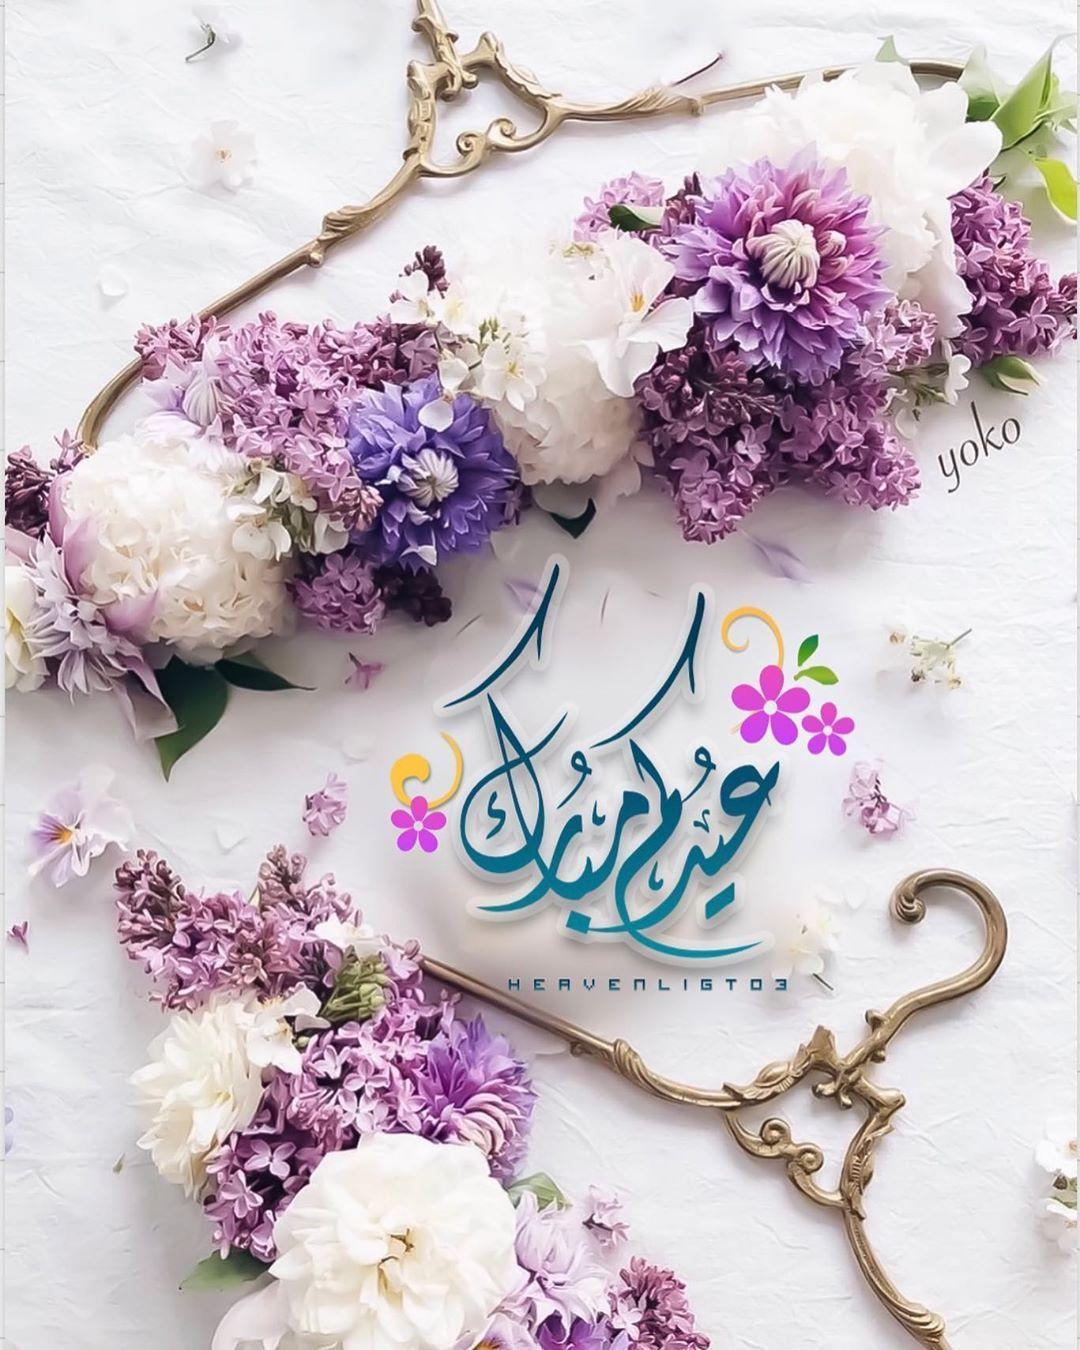 Muna S Instagram Post عيدكم مبارك عيد الاضحى عيد الاضحي المبارك2019 Eid Crafts Eid Mubarak Greetings Eid Stickers